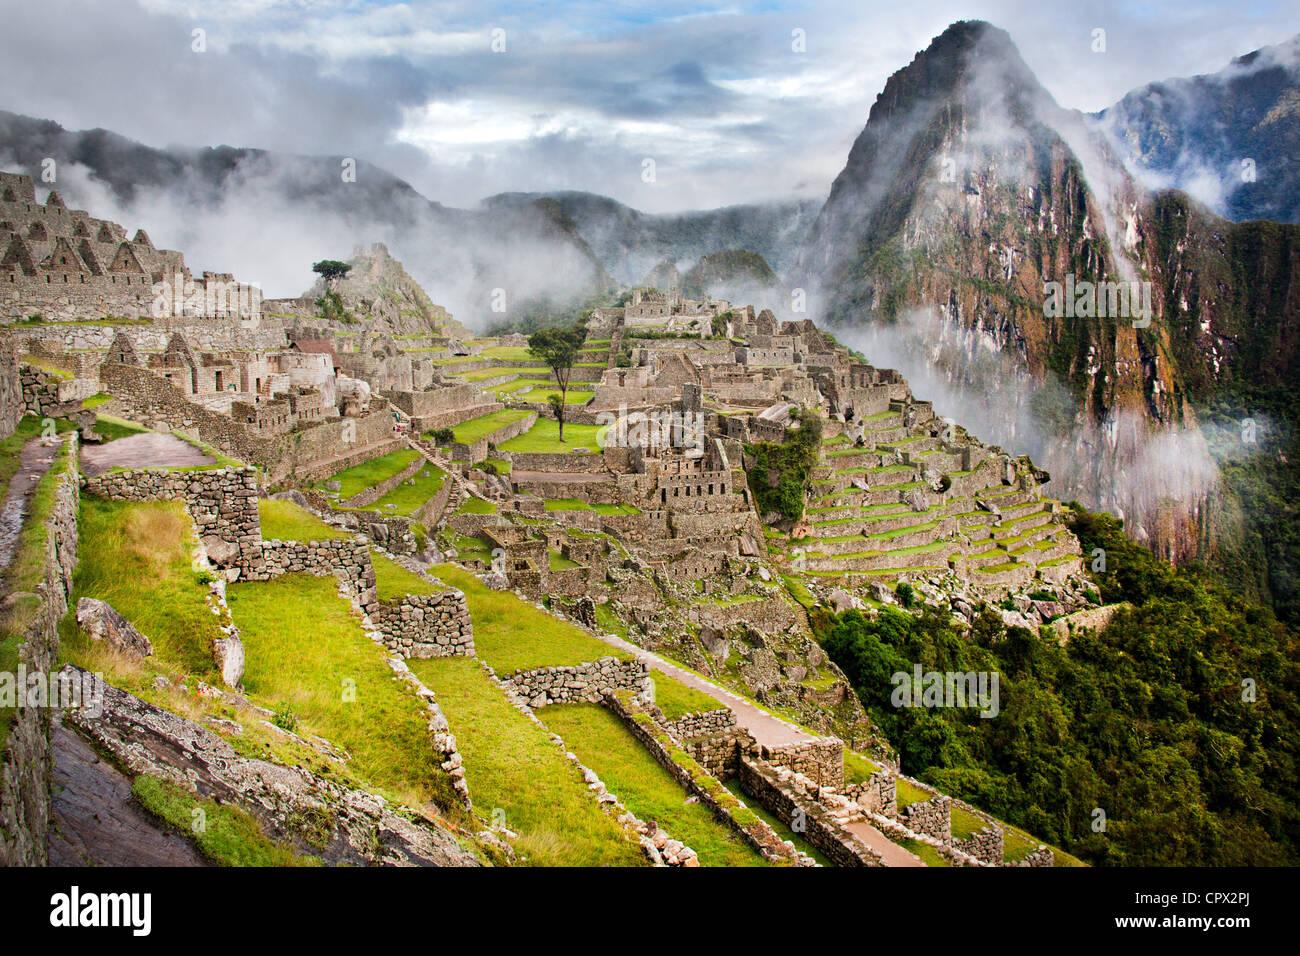 Machu Picchu, Perú, América del Sur Imagen De Stock